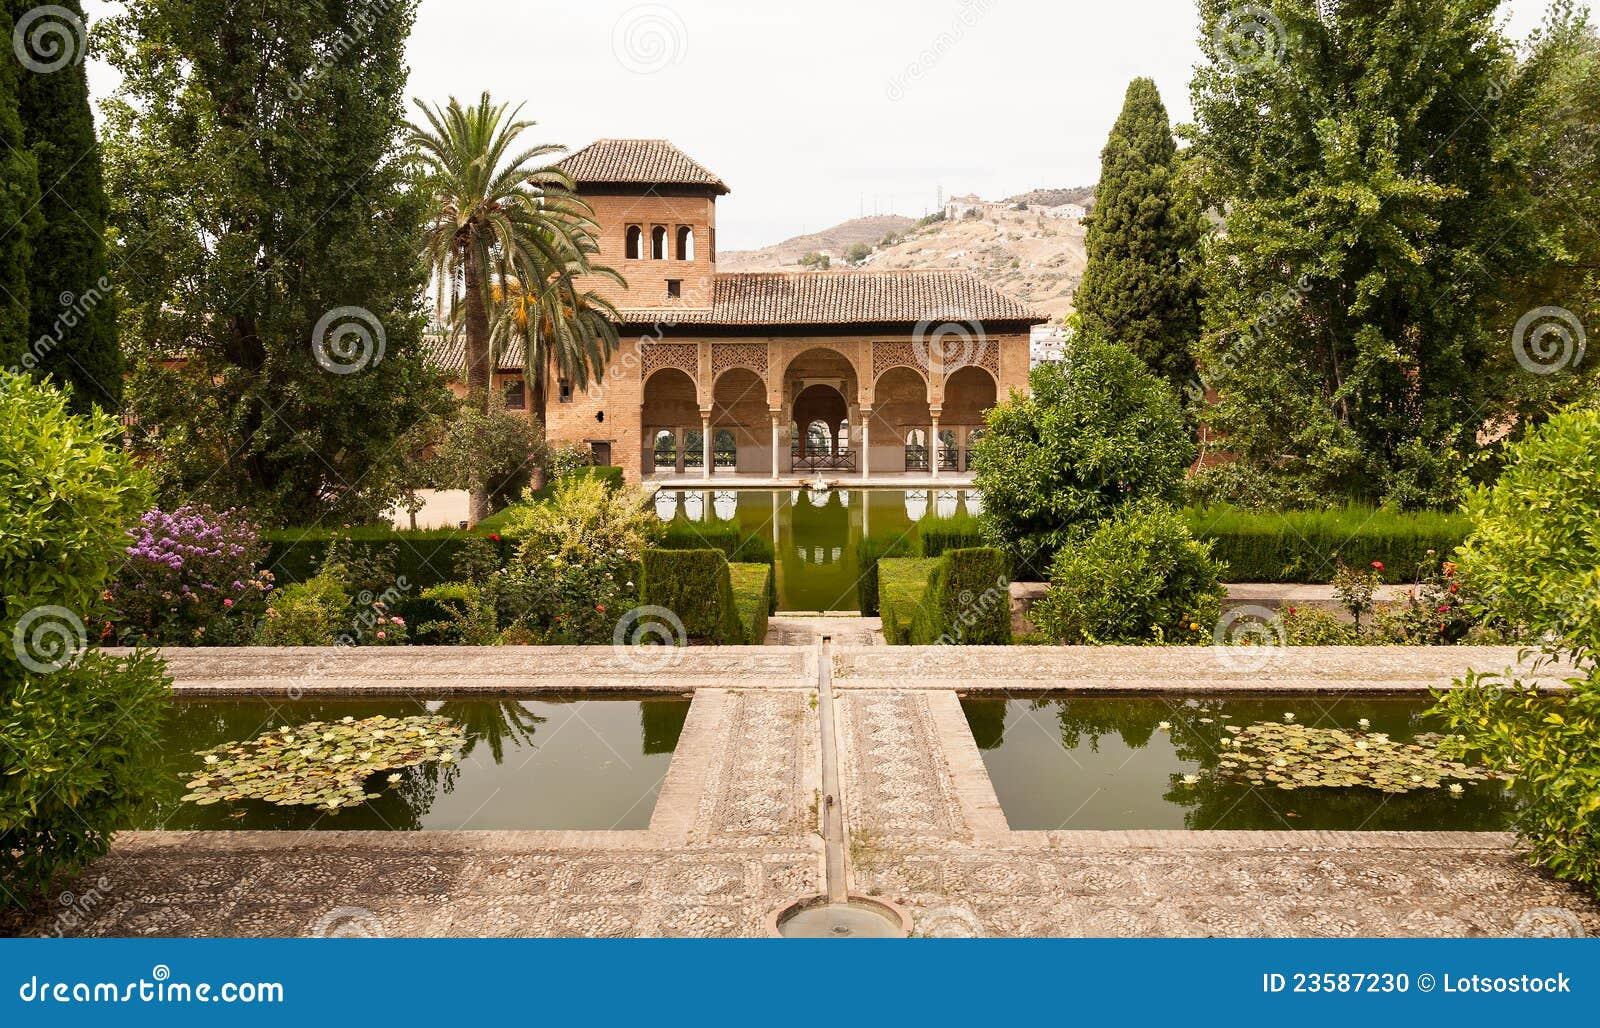 Generalife gardens inside the alhambra palace stock photo for Generalife gardens